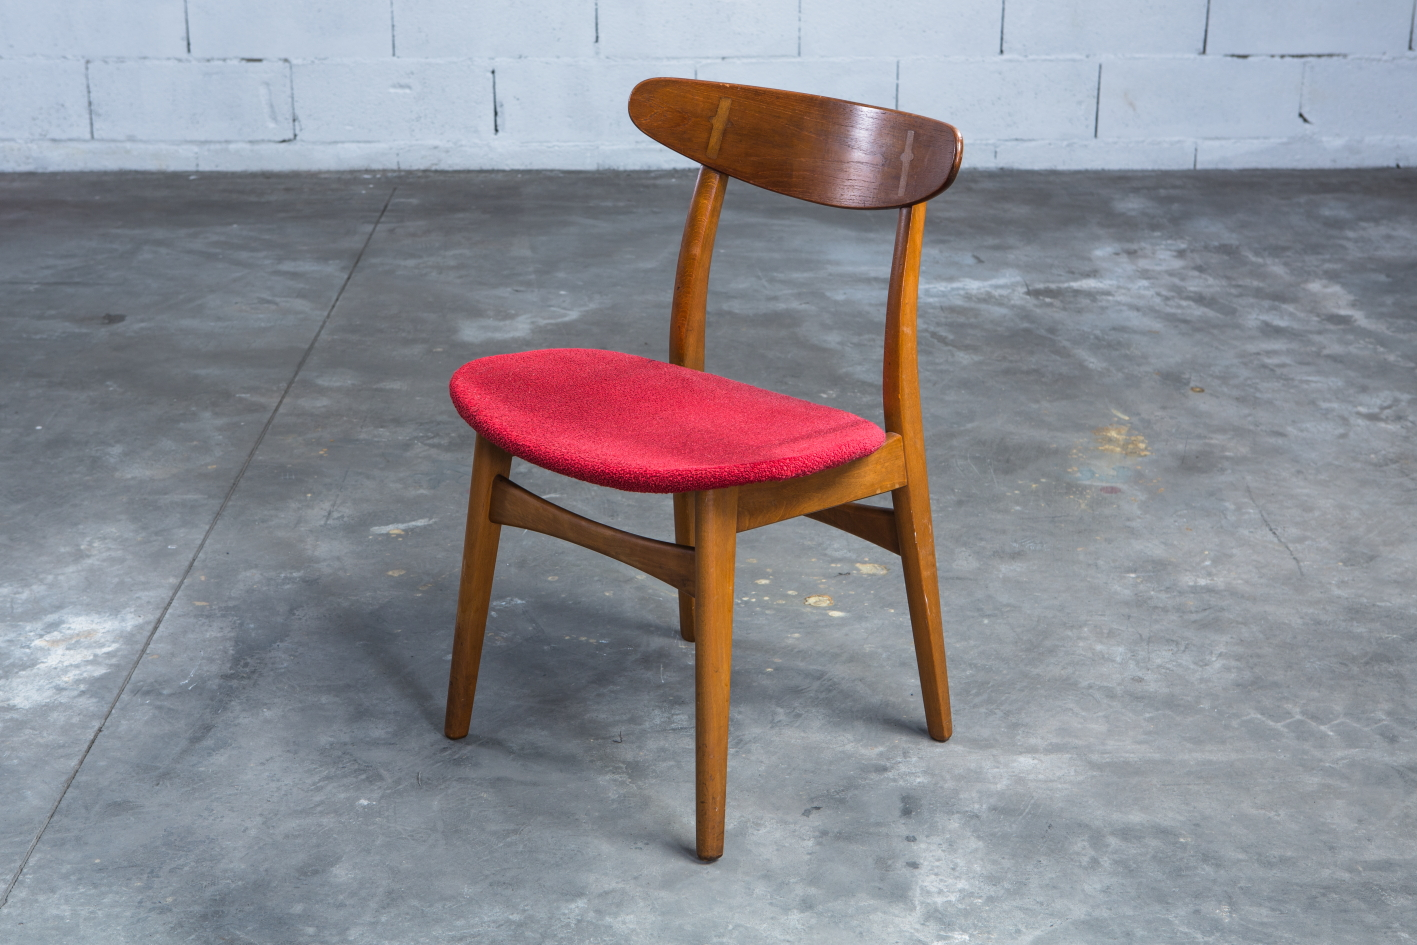 CH 30 chairs - Hans J. Wegner for Carl Hansen - 3/4 front view